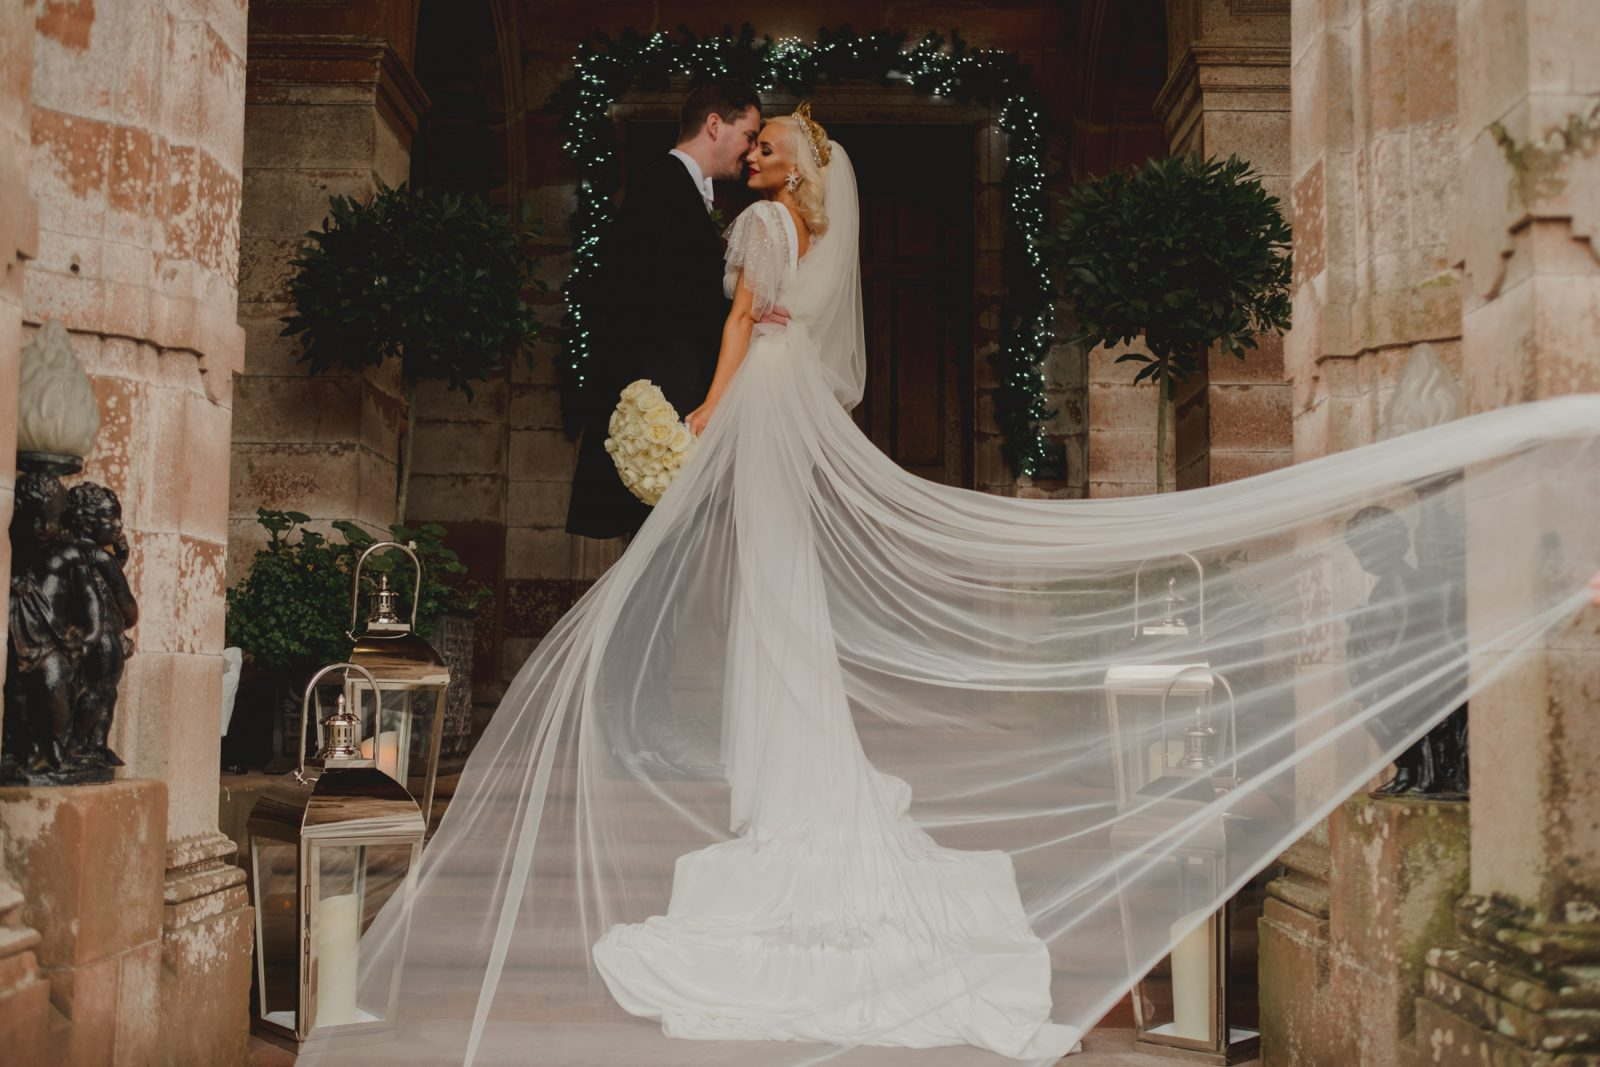 CASTLE-LESLIE-WEDDING-PHOTOGRAPHY-77